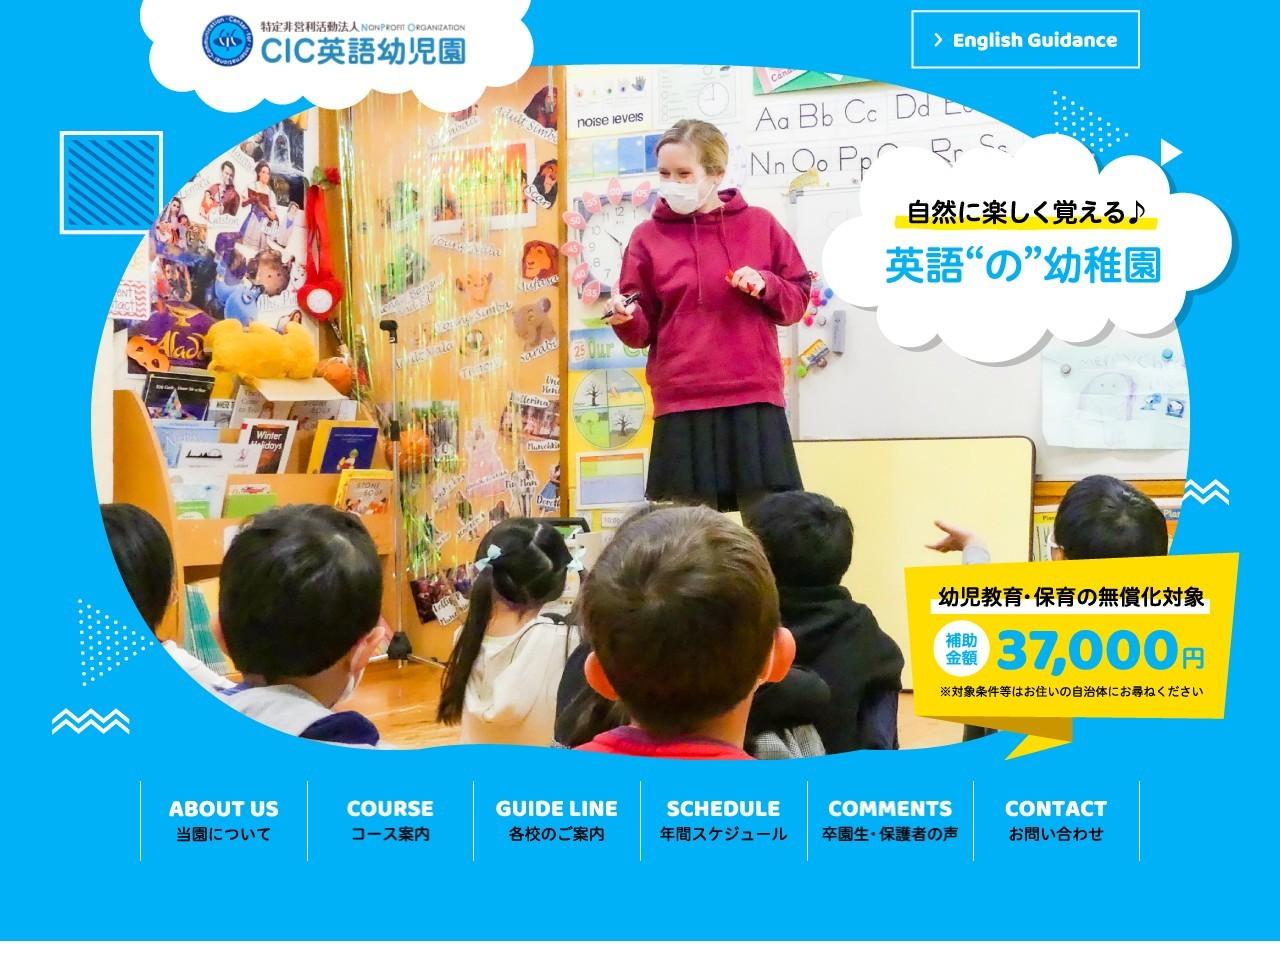 CIC英語幼児園小倉校